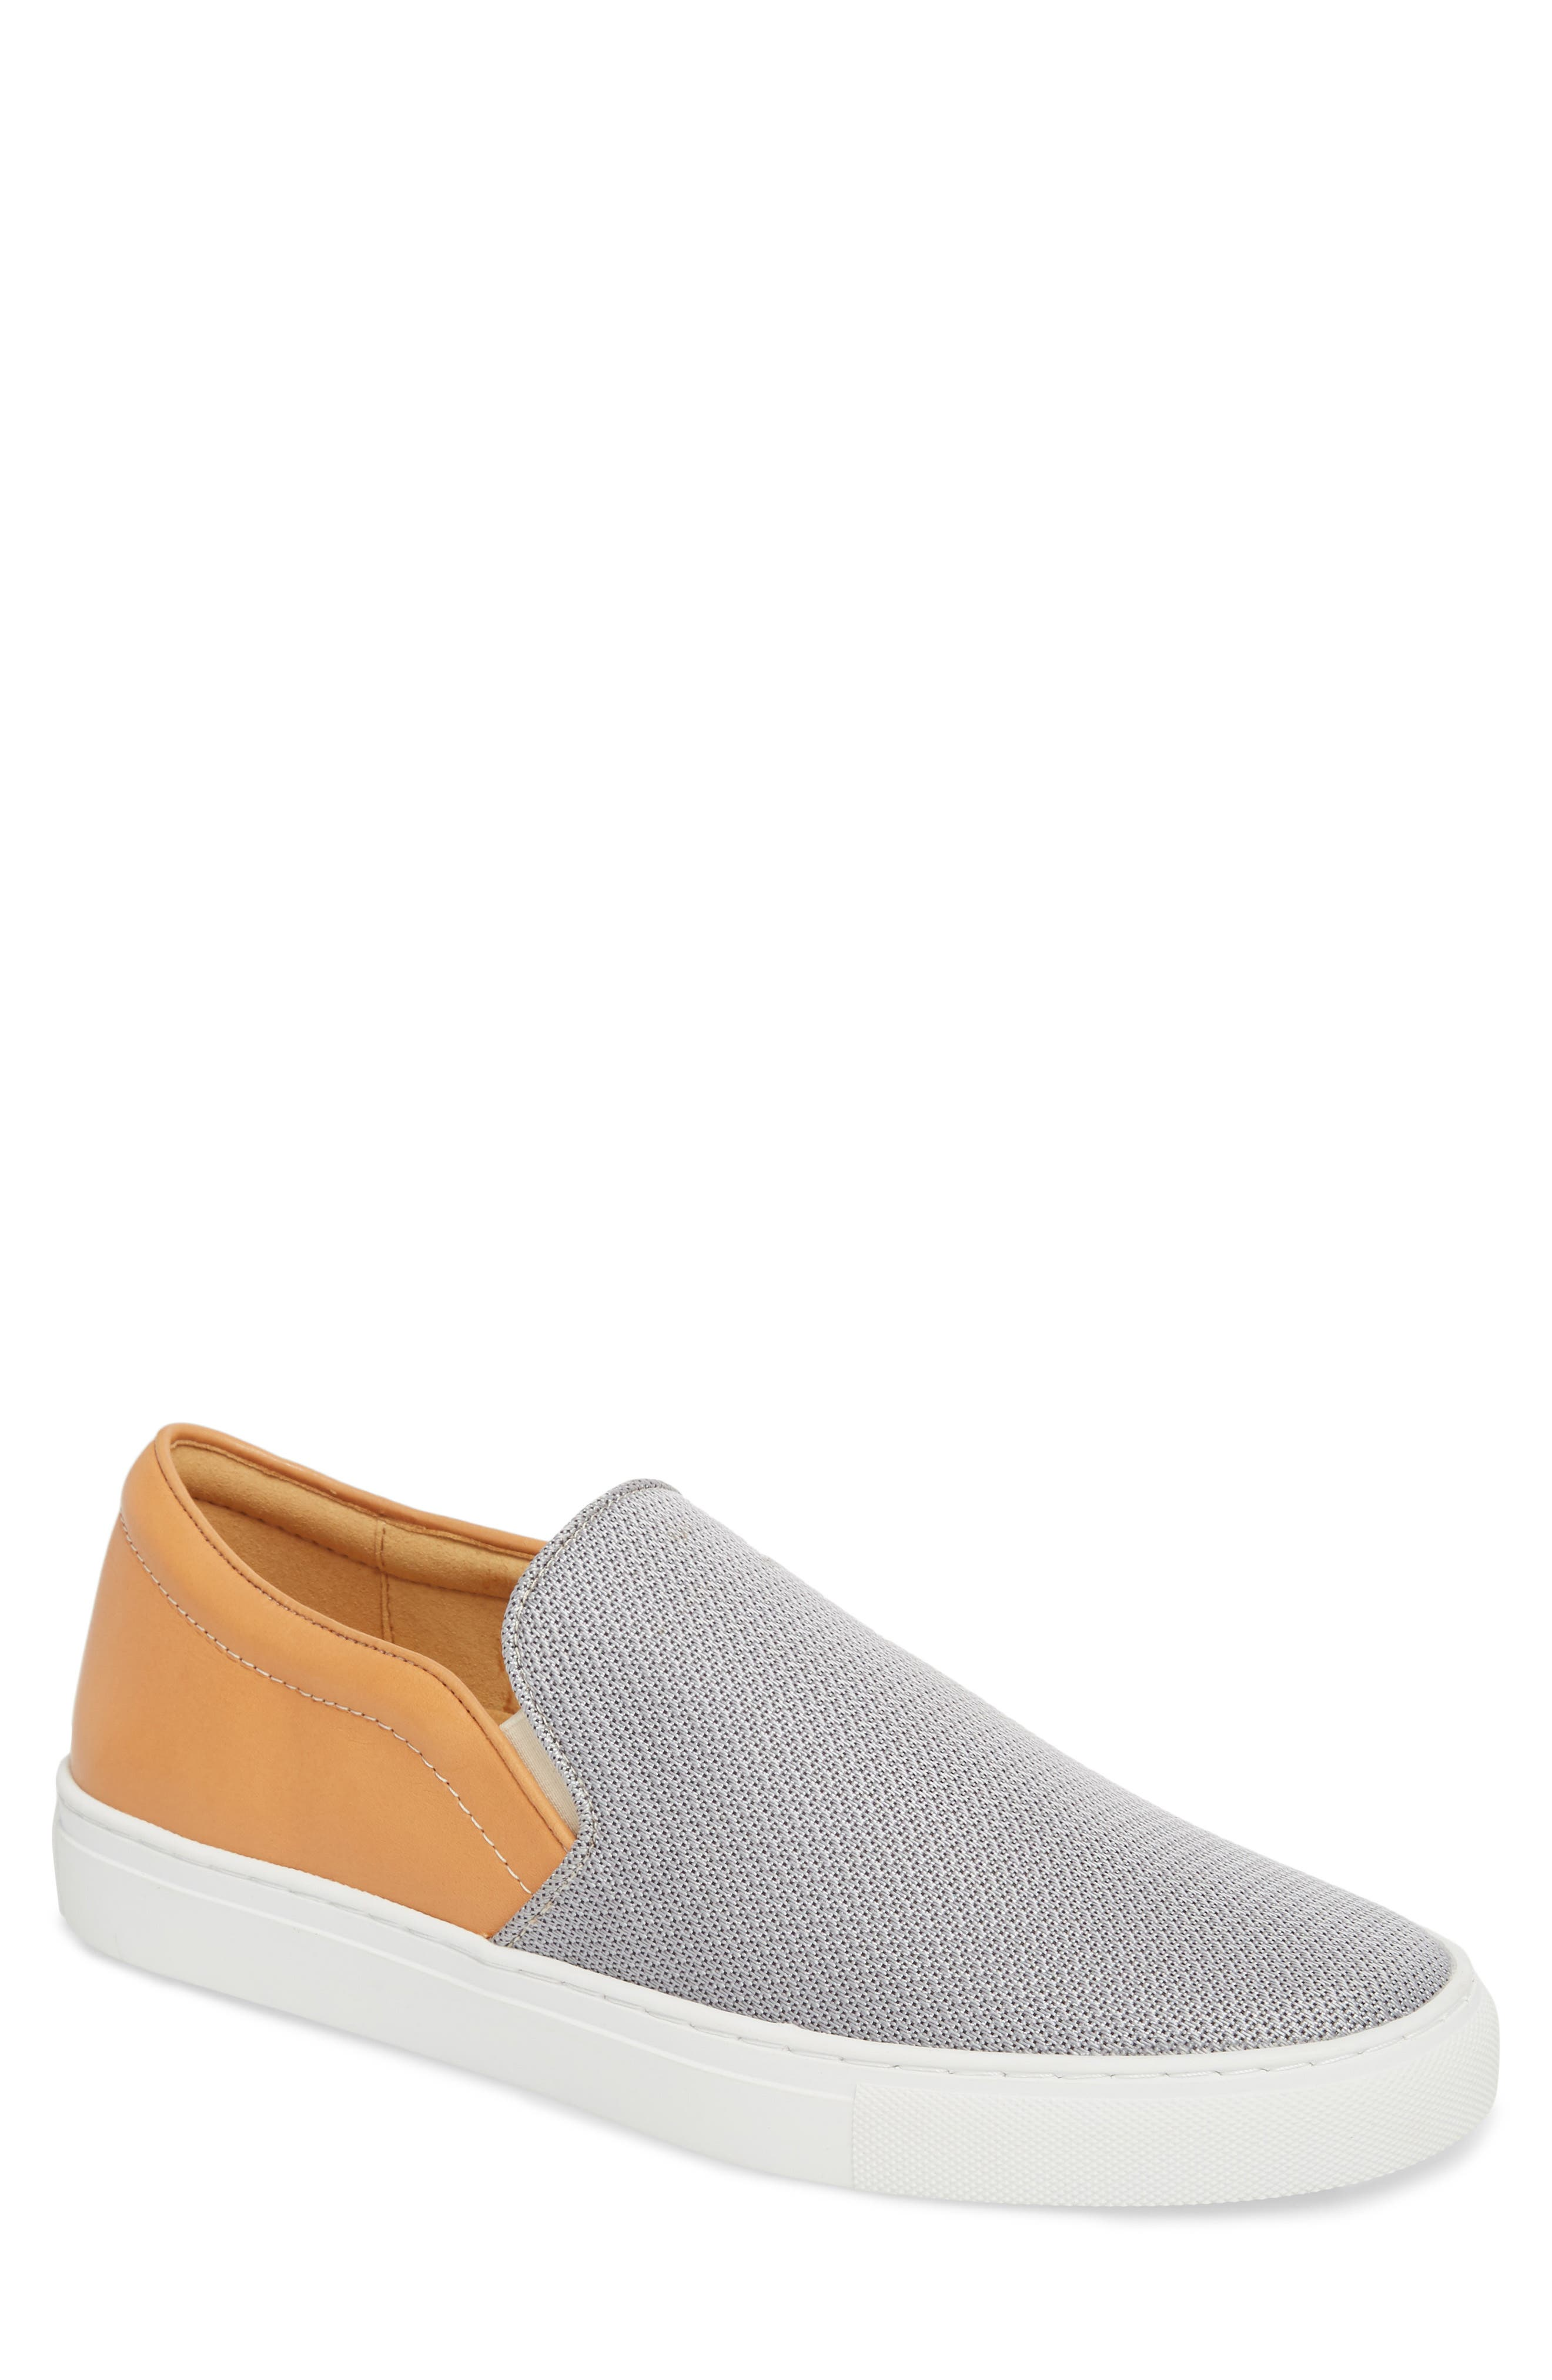 Albin Raffia Slip-On Sneaker,                             Main thumbnail 1, color,                             041